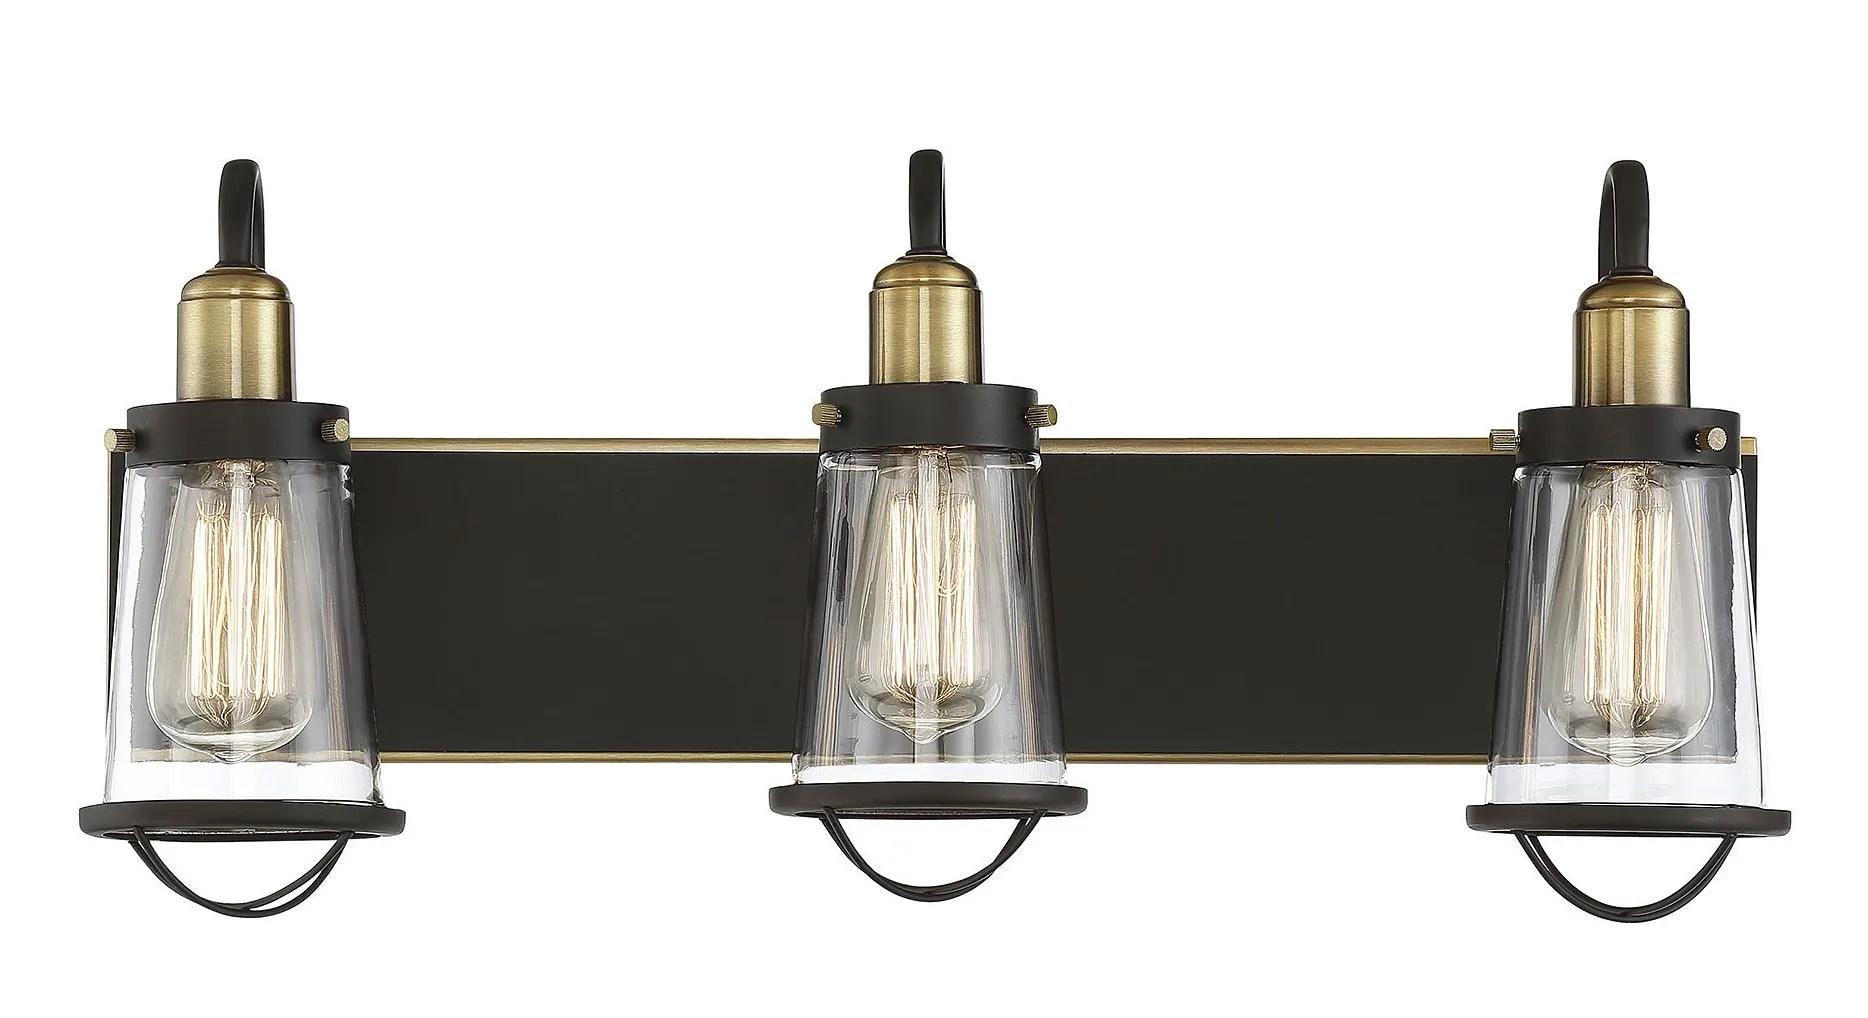 savoy house lansing 3 light bathroom vanity light in english bronze